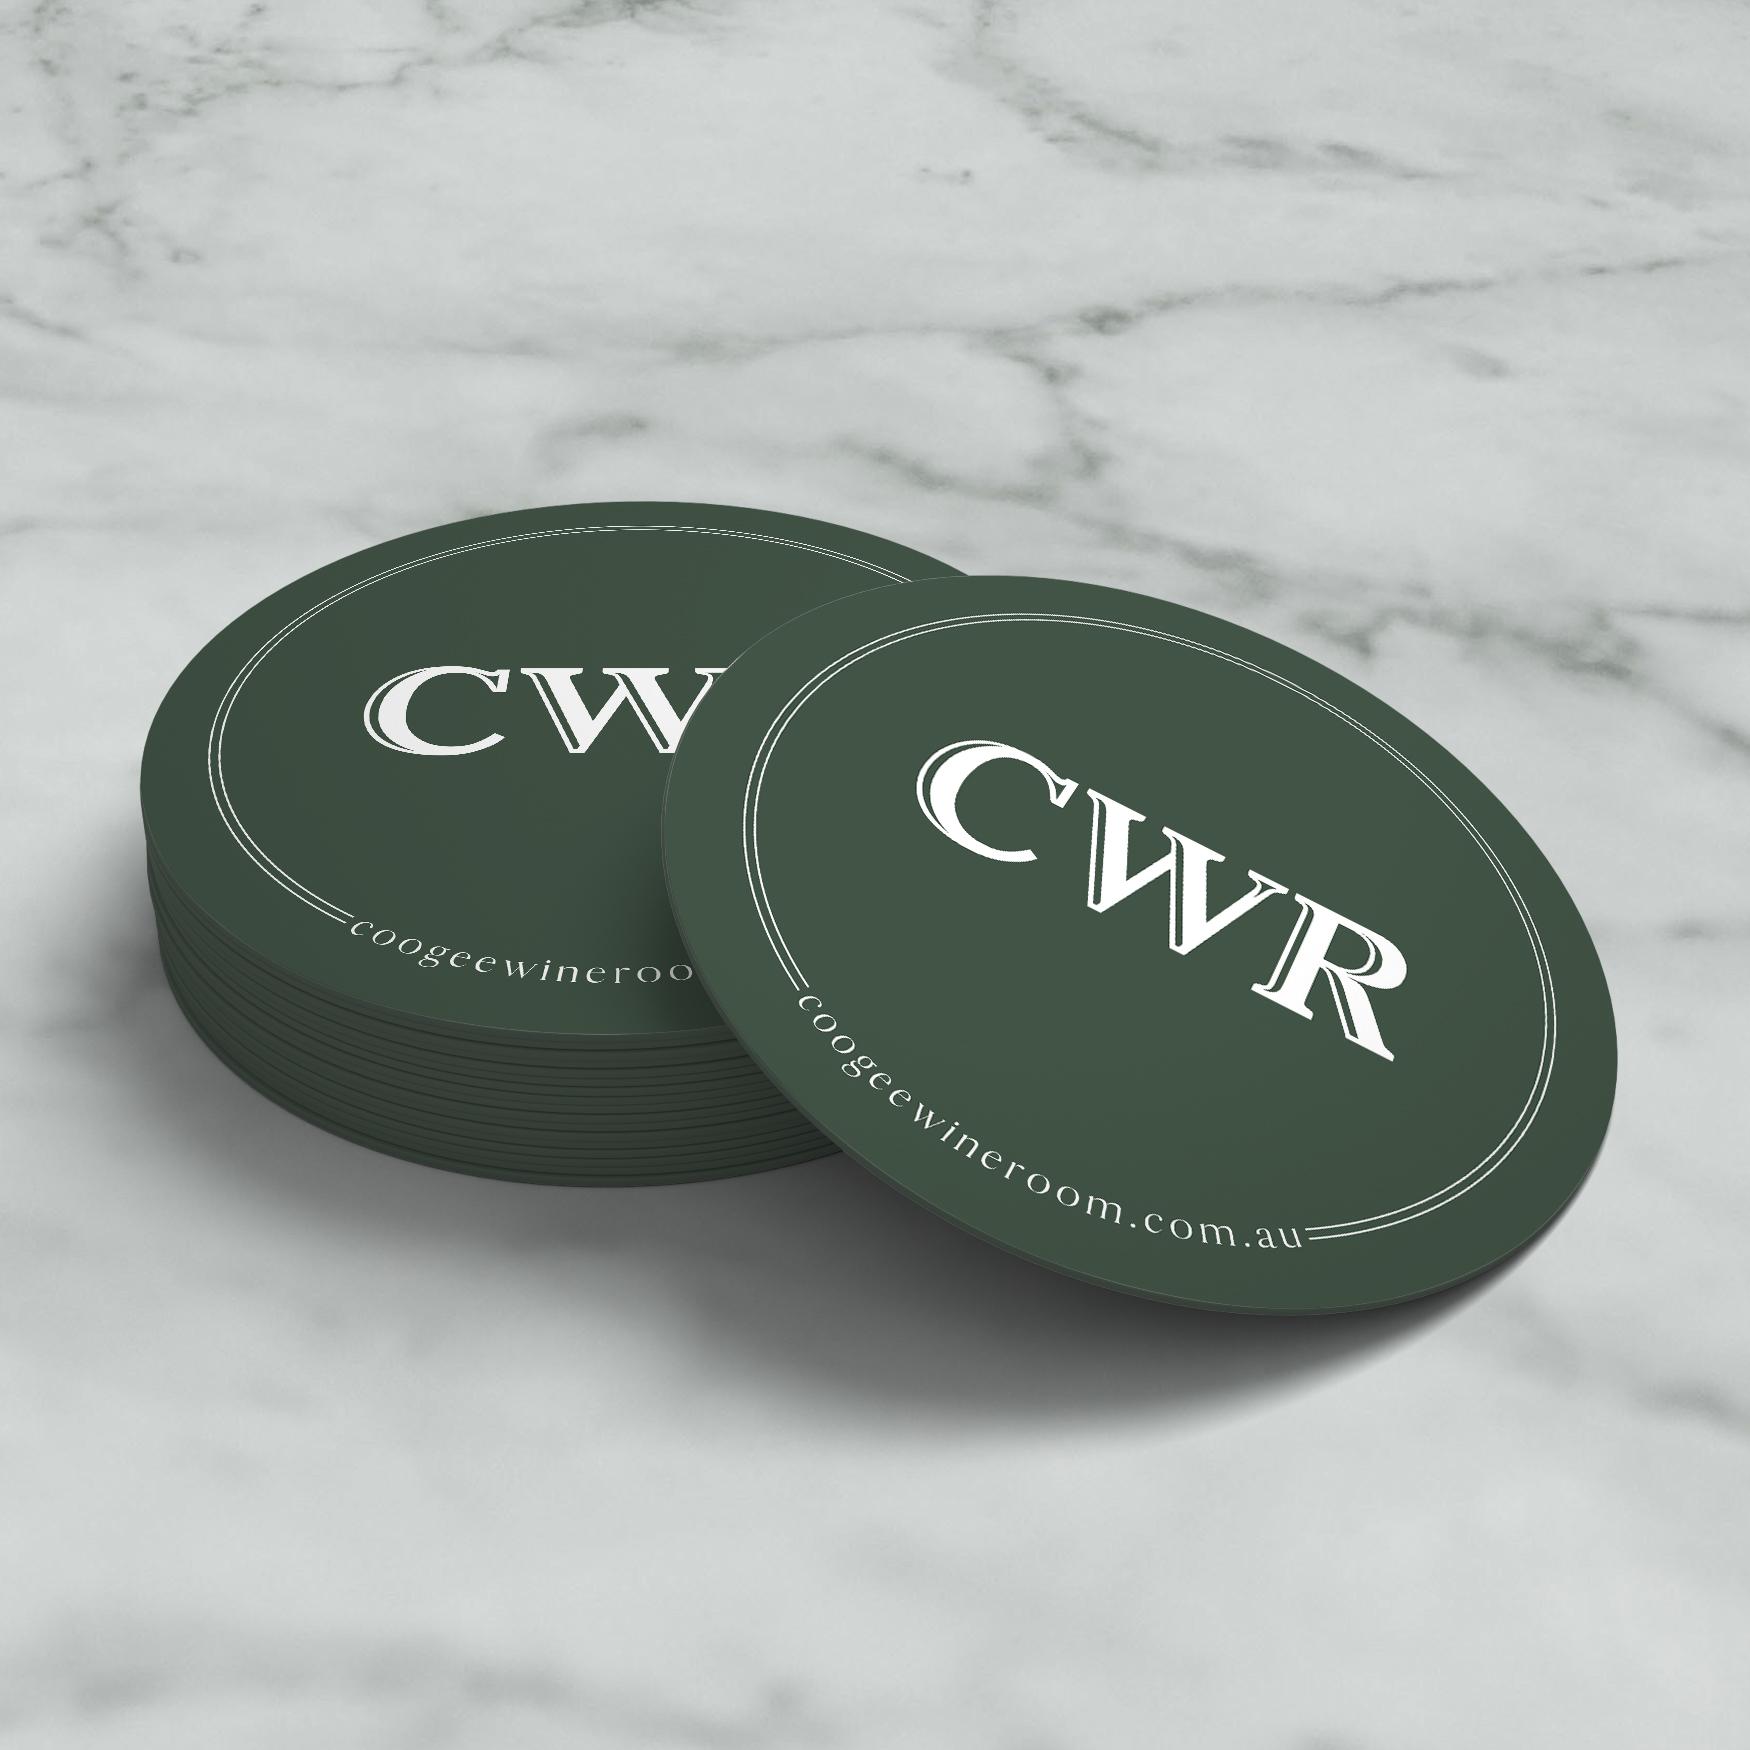 sydney design social coogee wine room logo branding coasters